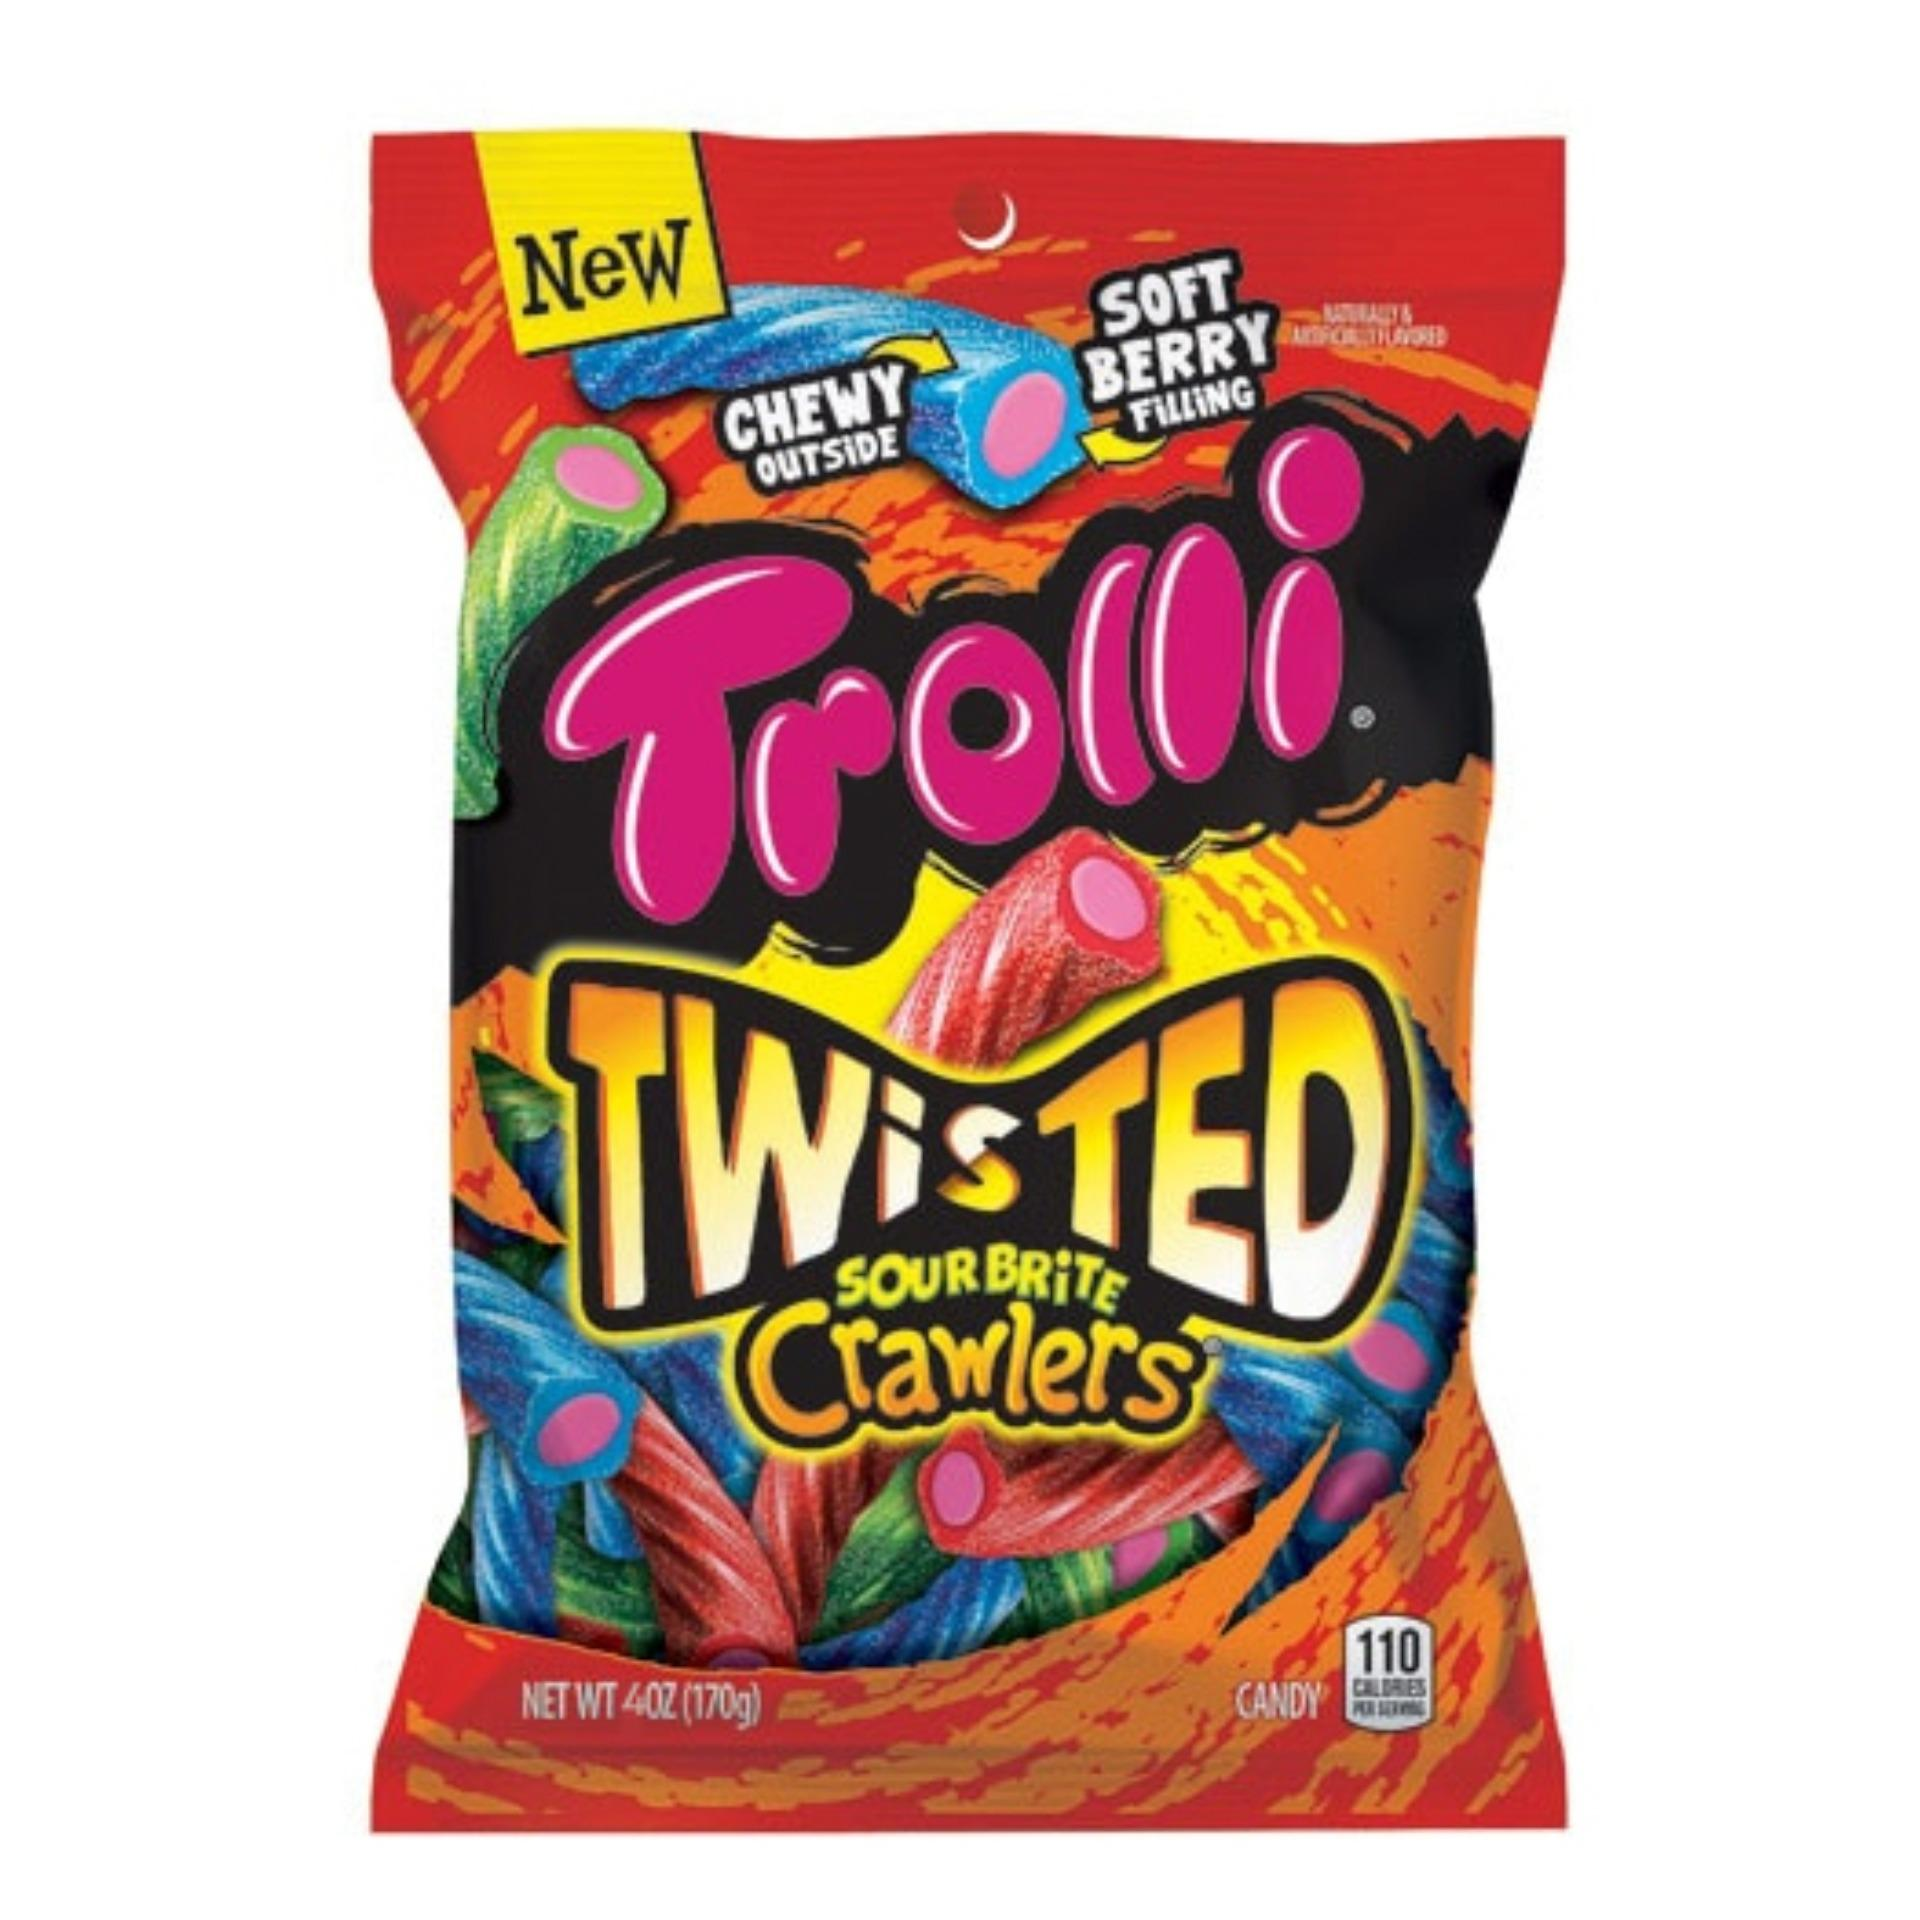 Kẹo dẻo Trolli Twisted Sour Brite Crawlers